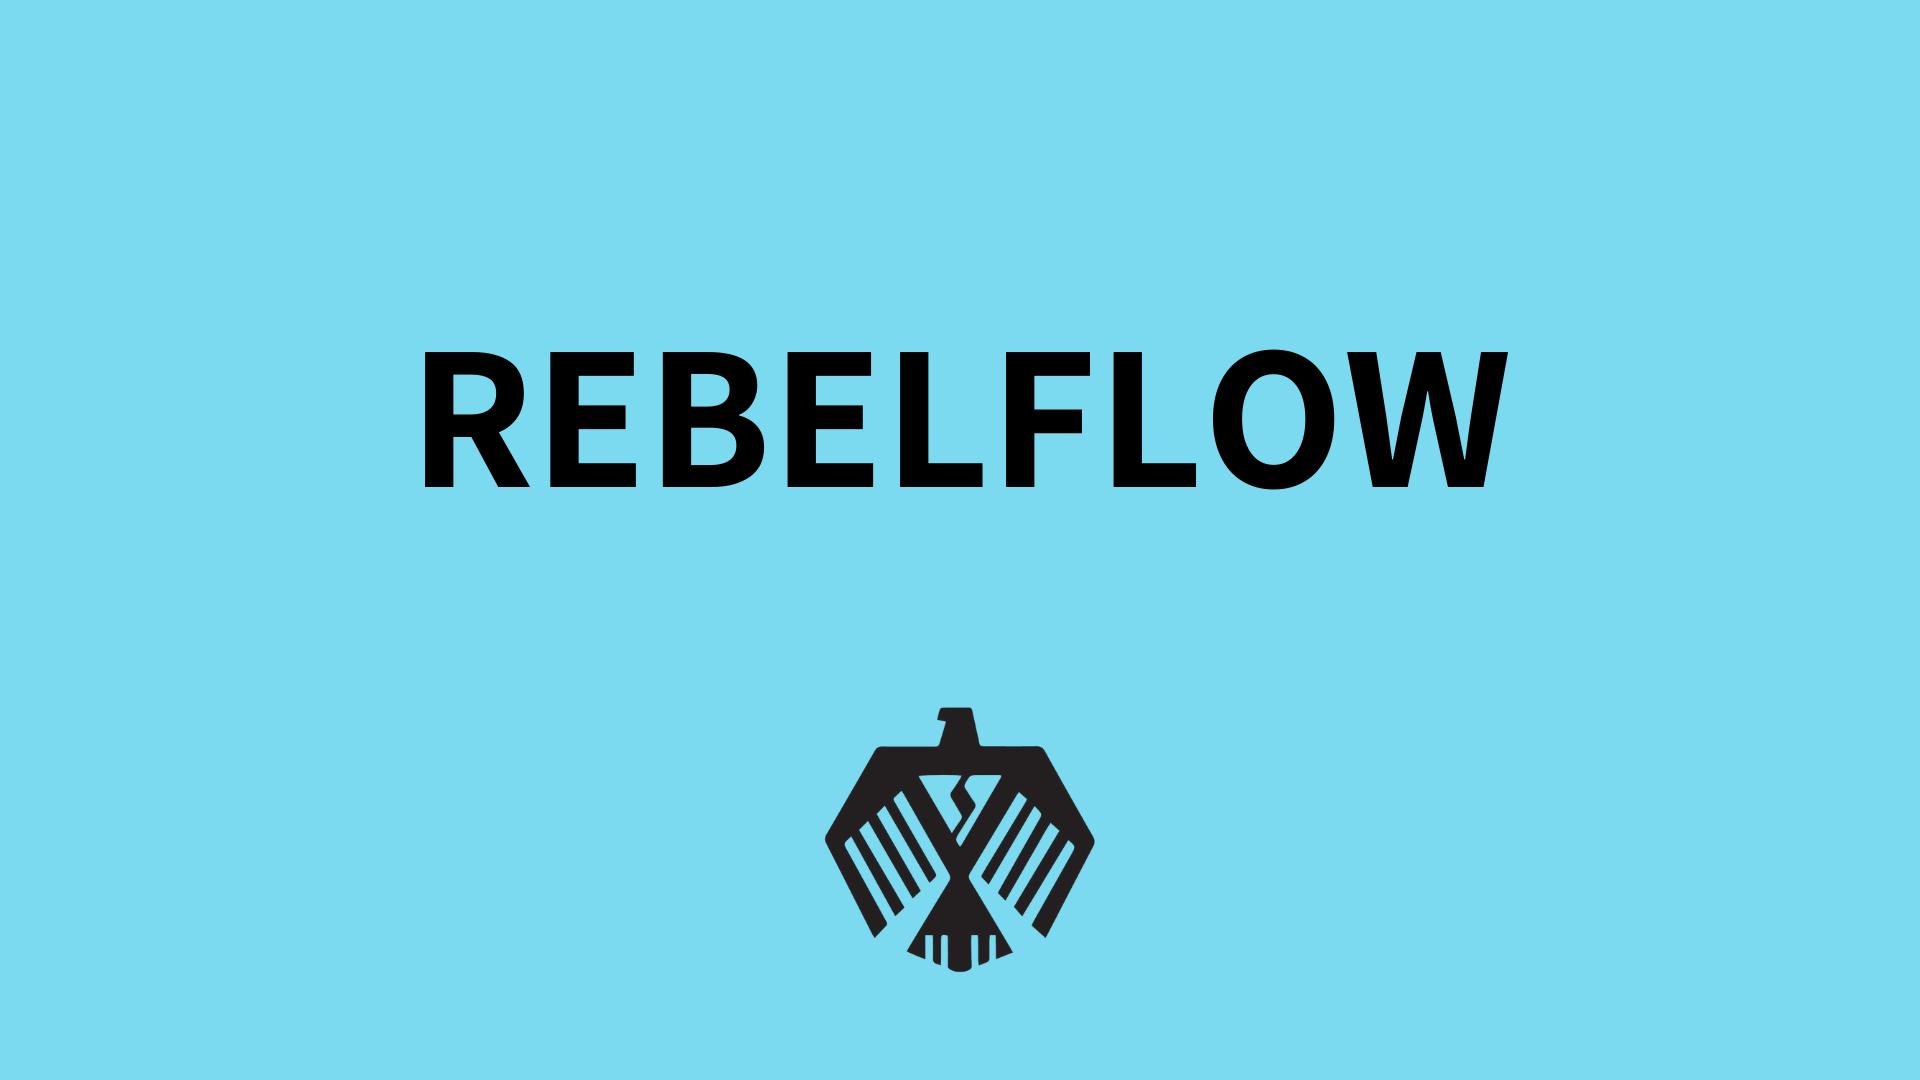 REBELFLOW